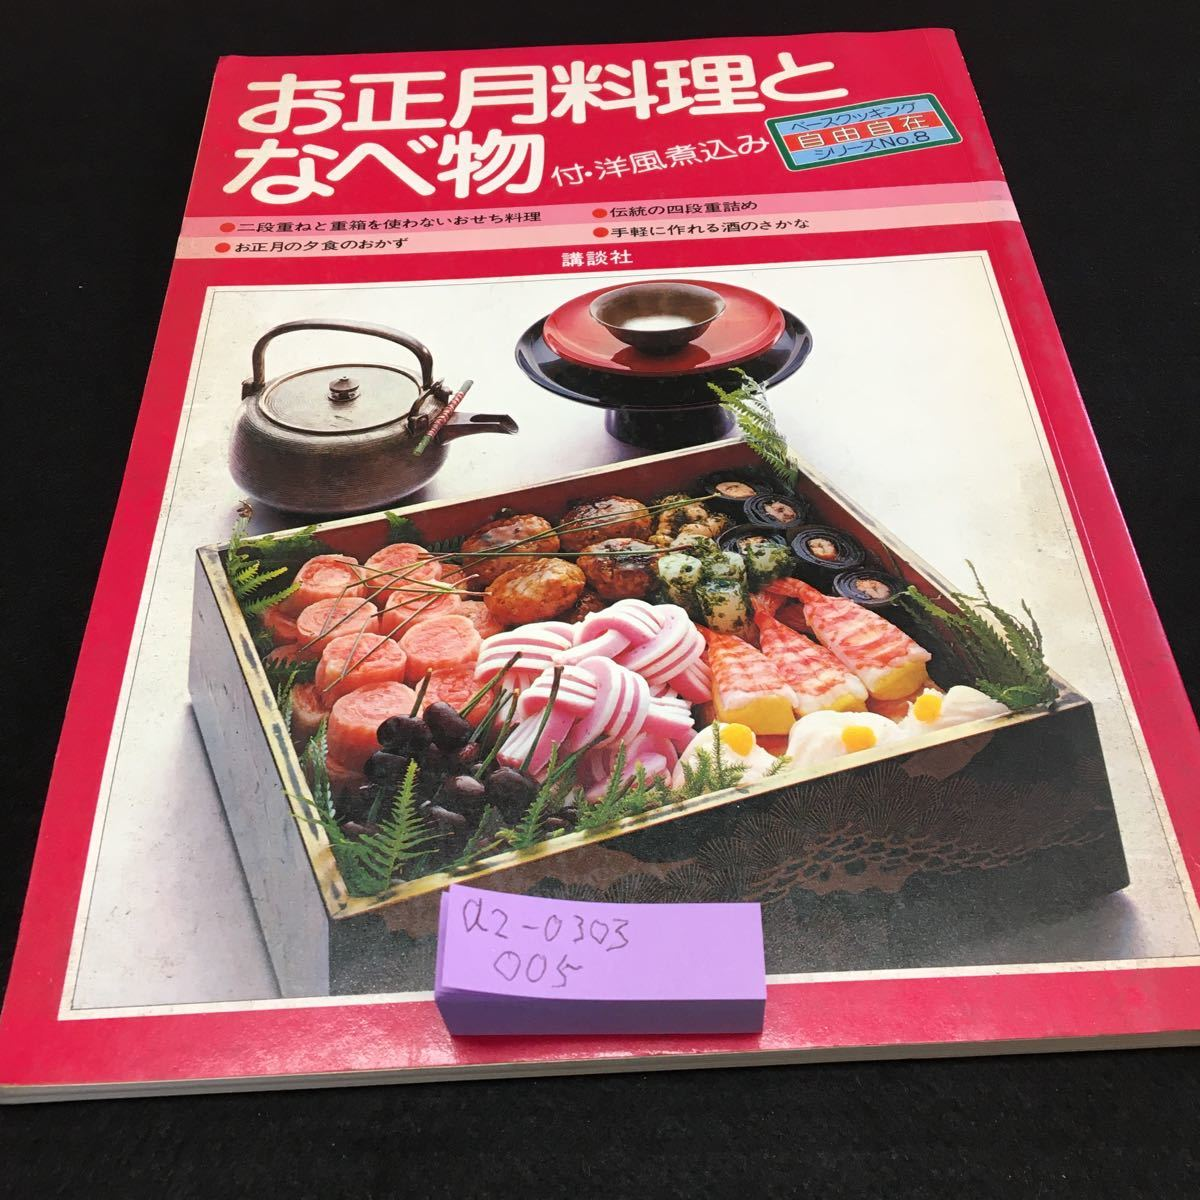 a2-0303-005 お正月料理となべ物 講談社 昭和54年12月20日第1刷発行 おせち料理 ※12